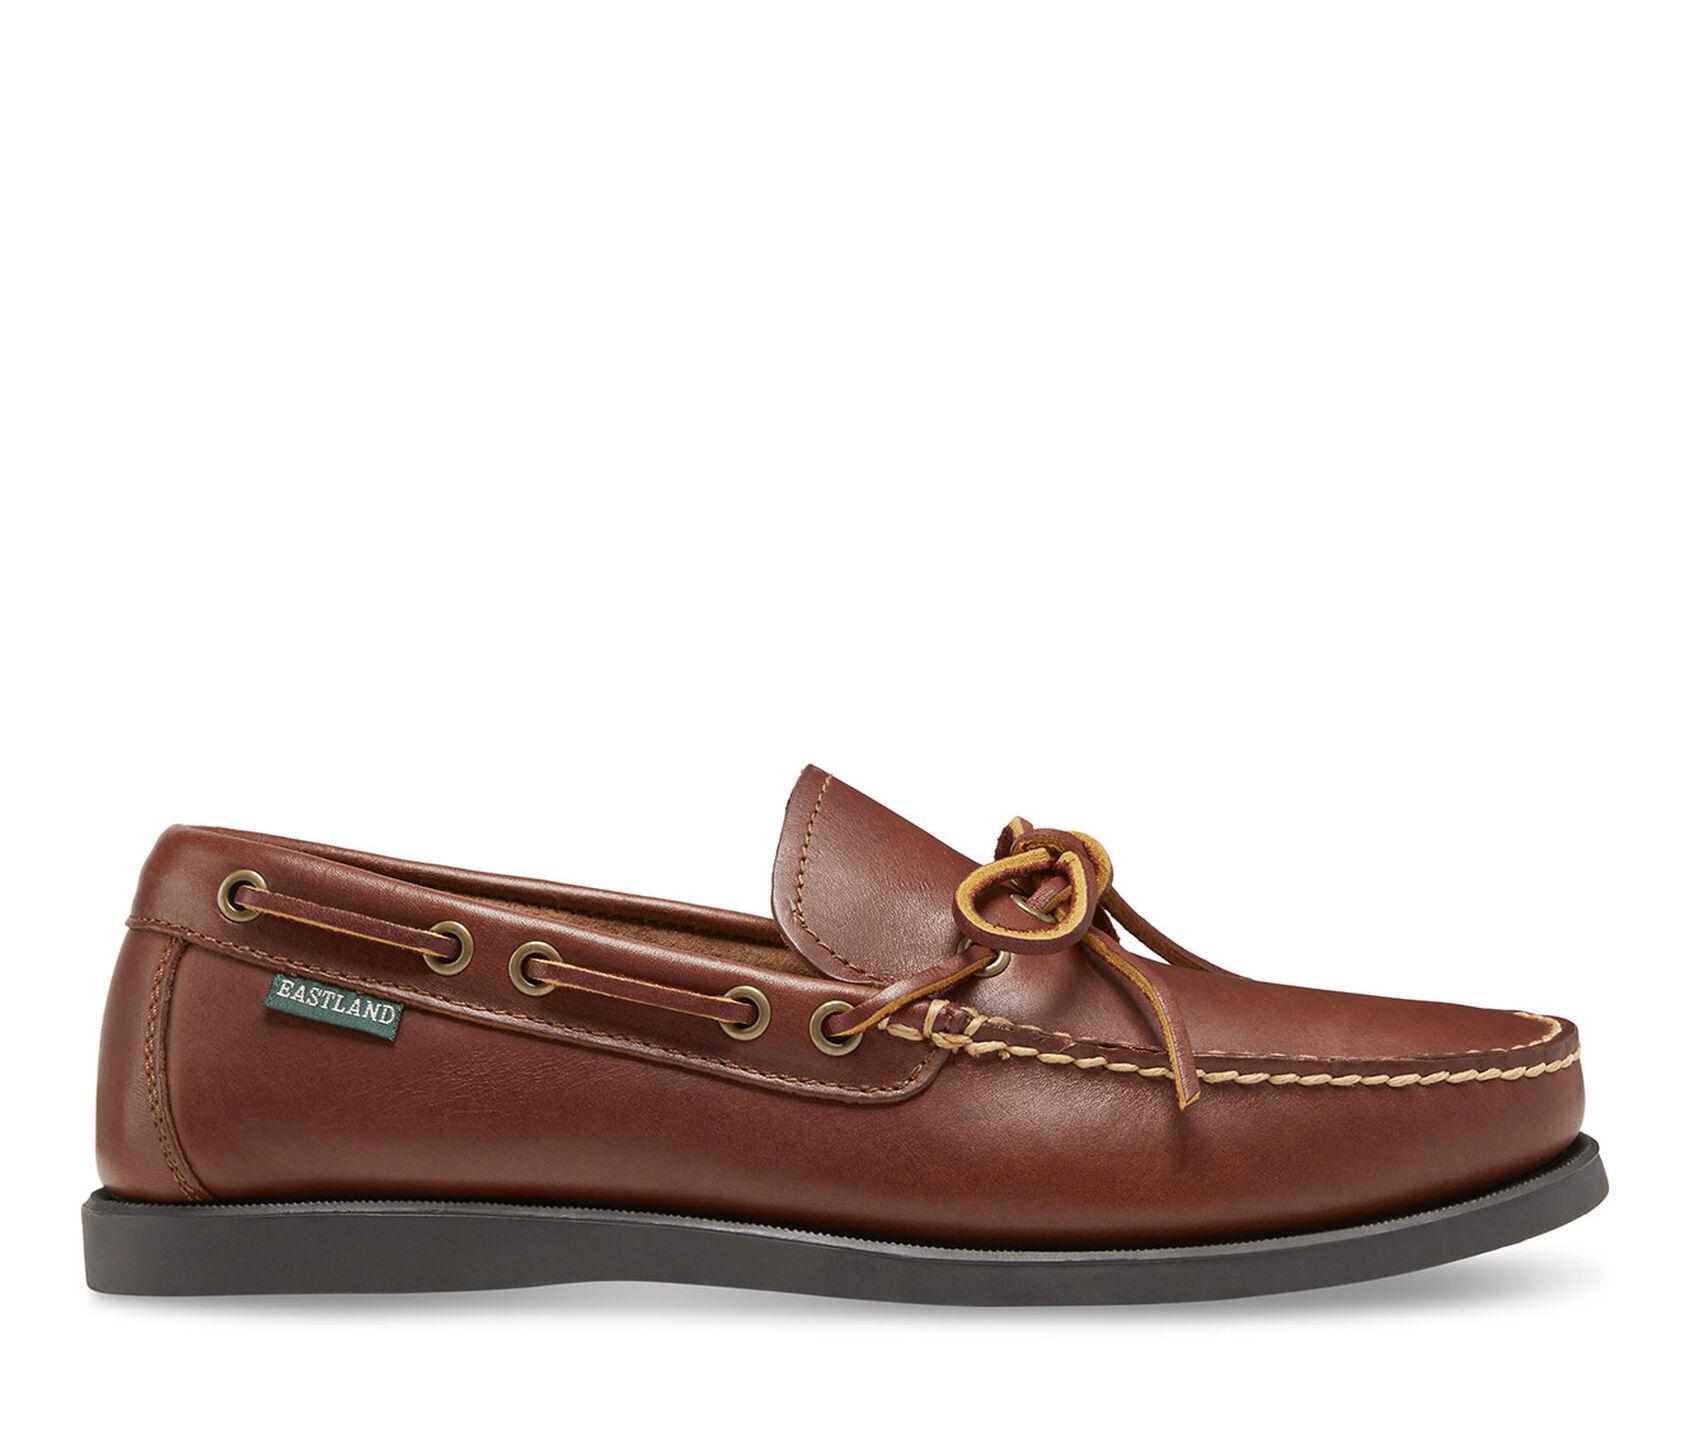 306704201b265 Men's Eastland Yarmouth Boat Shoes